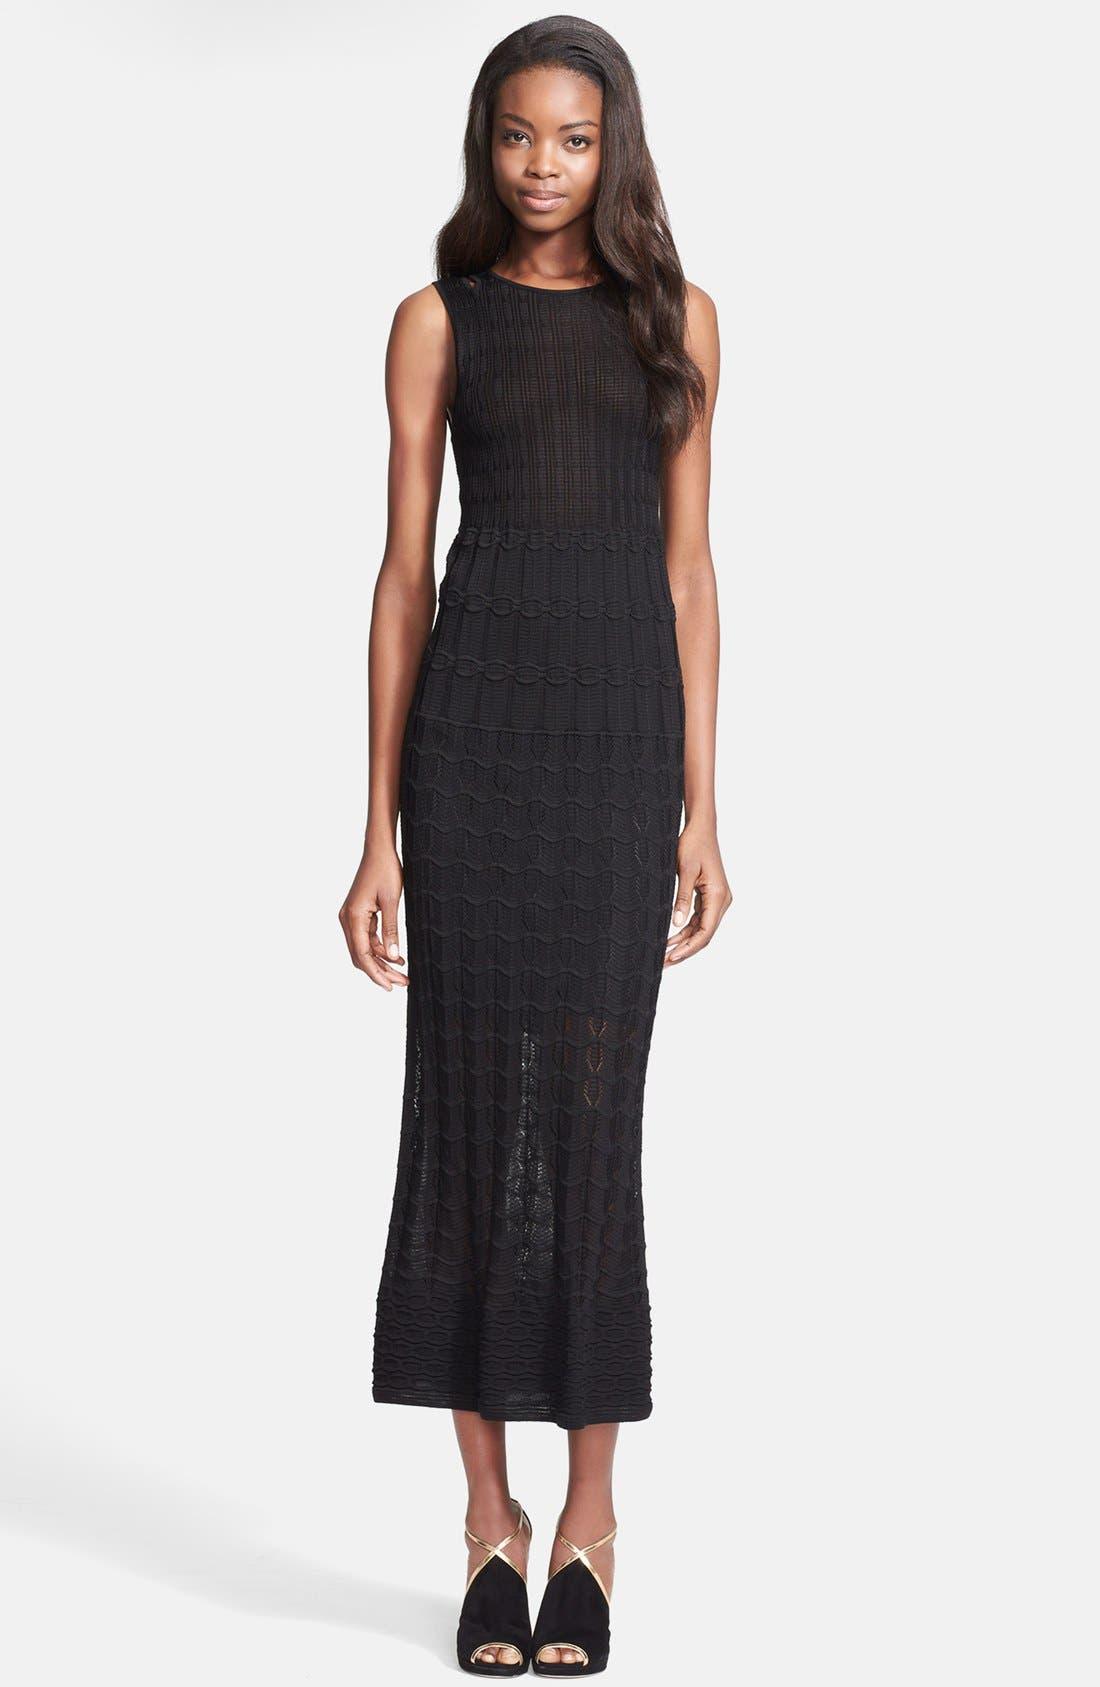 Main Image - M Missoni Knit Cotton Blend Midi Dress